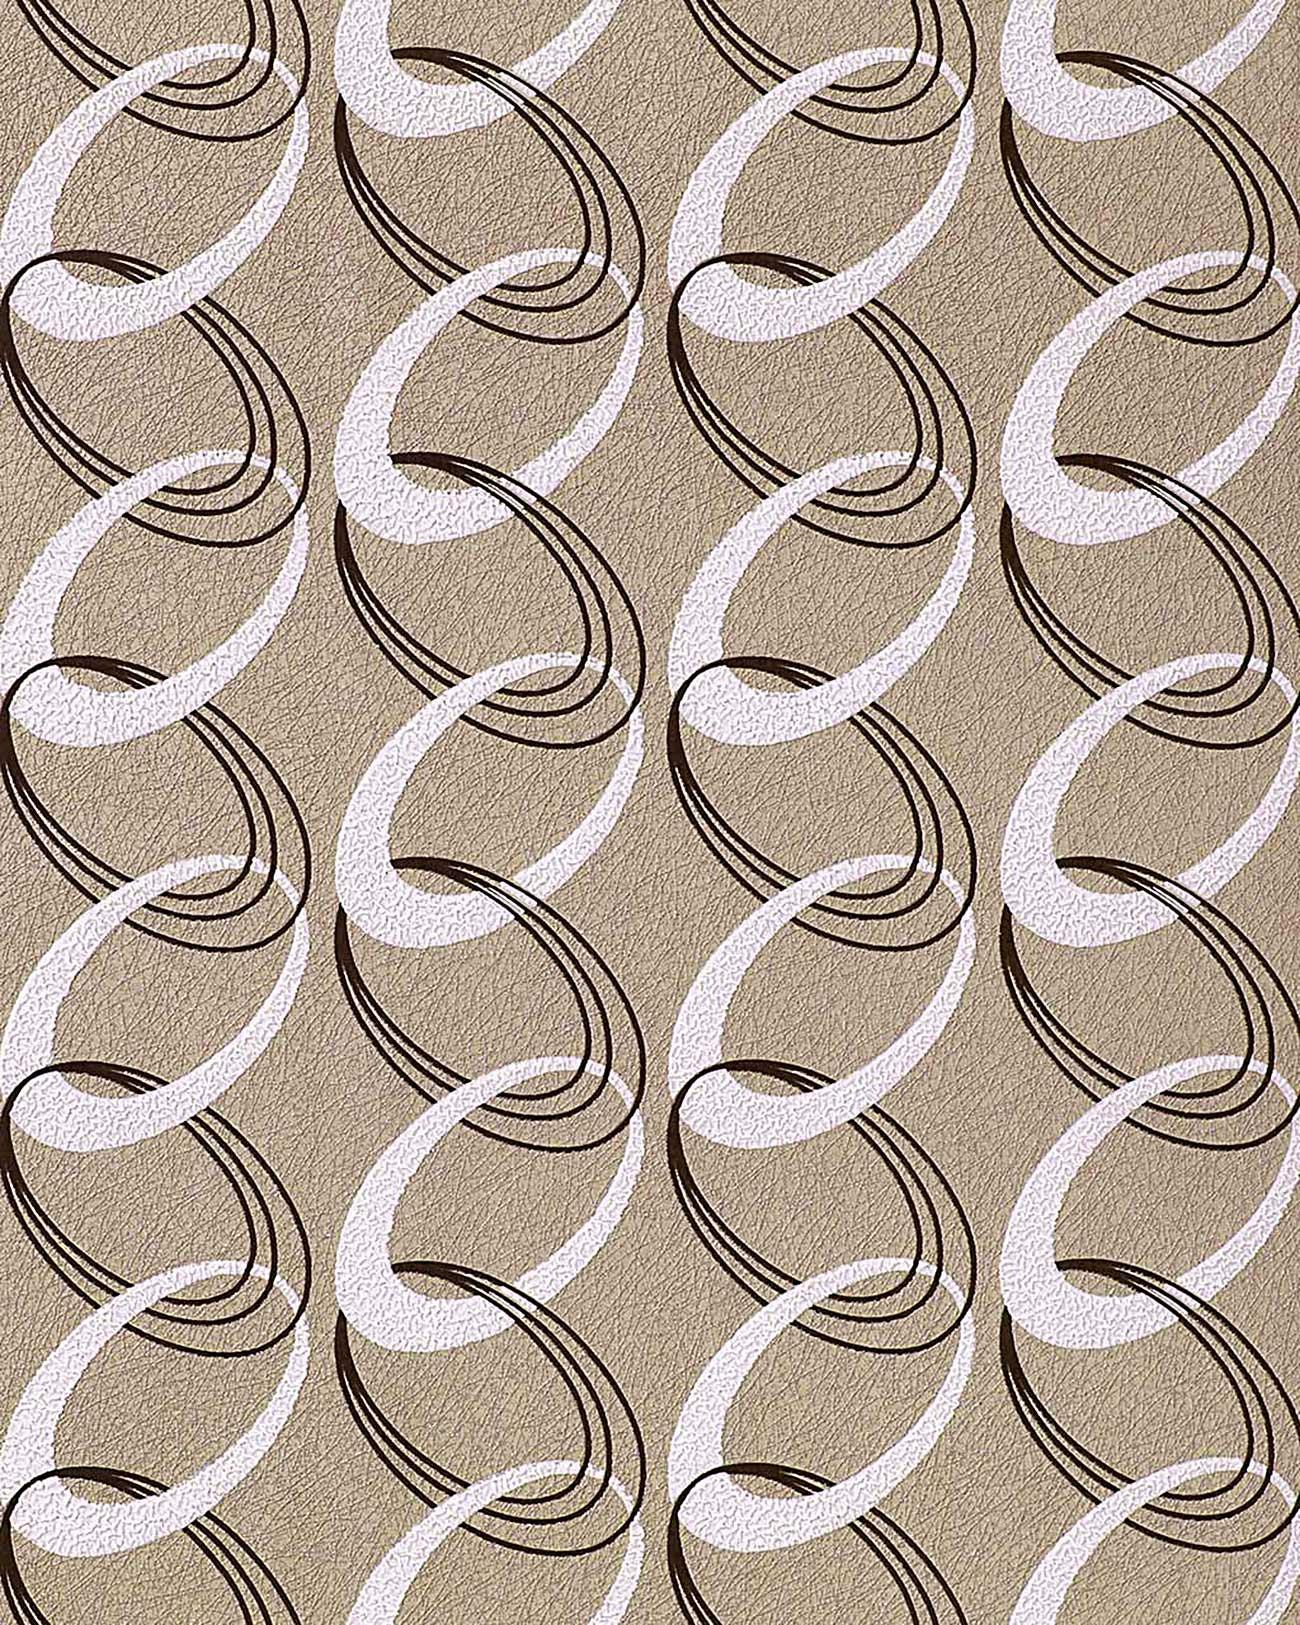 retro tapete edem 1017 13 retrotapete 70er jahre retro rings tapete ketten muster hochwaschbare. Black Bedroom Furniture Sets. Home Design Ideas